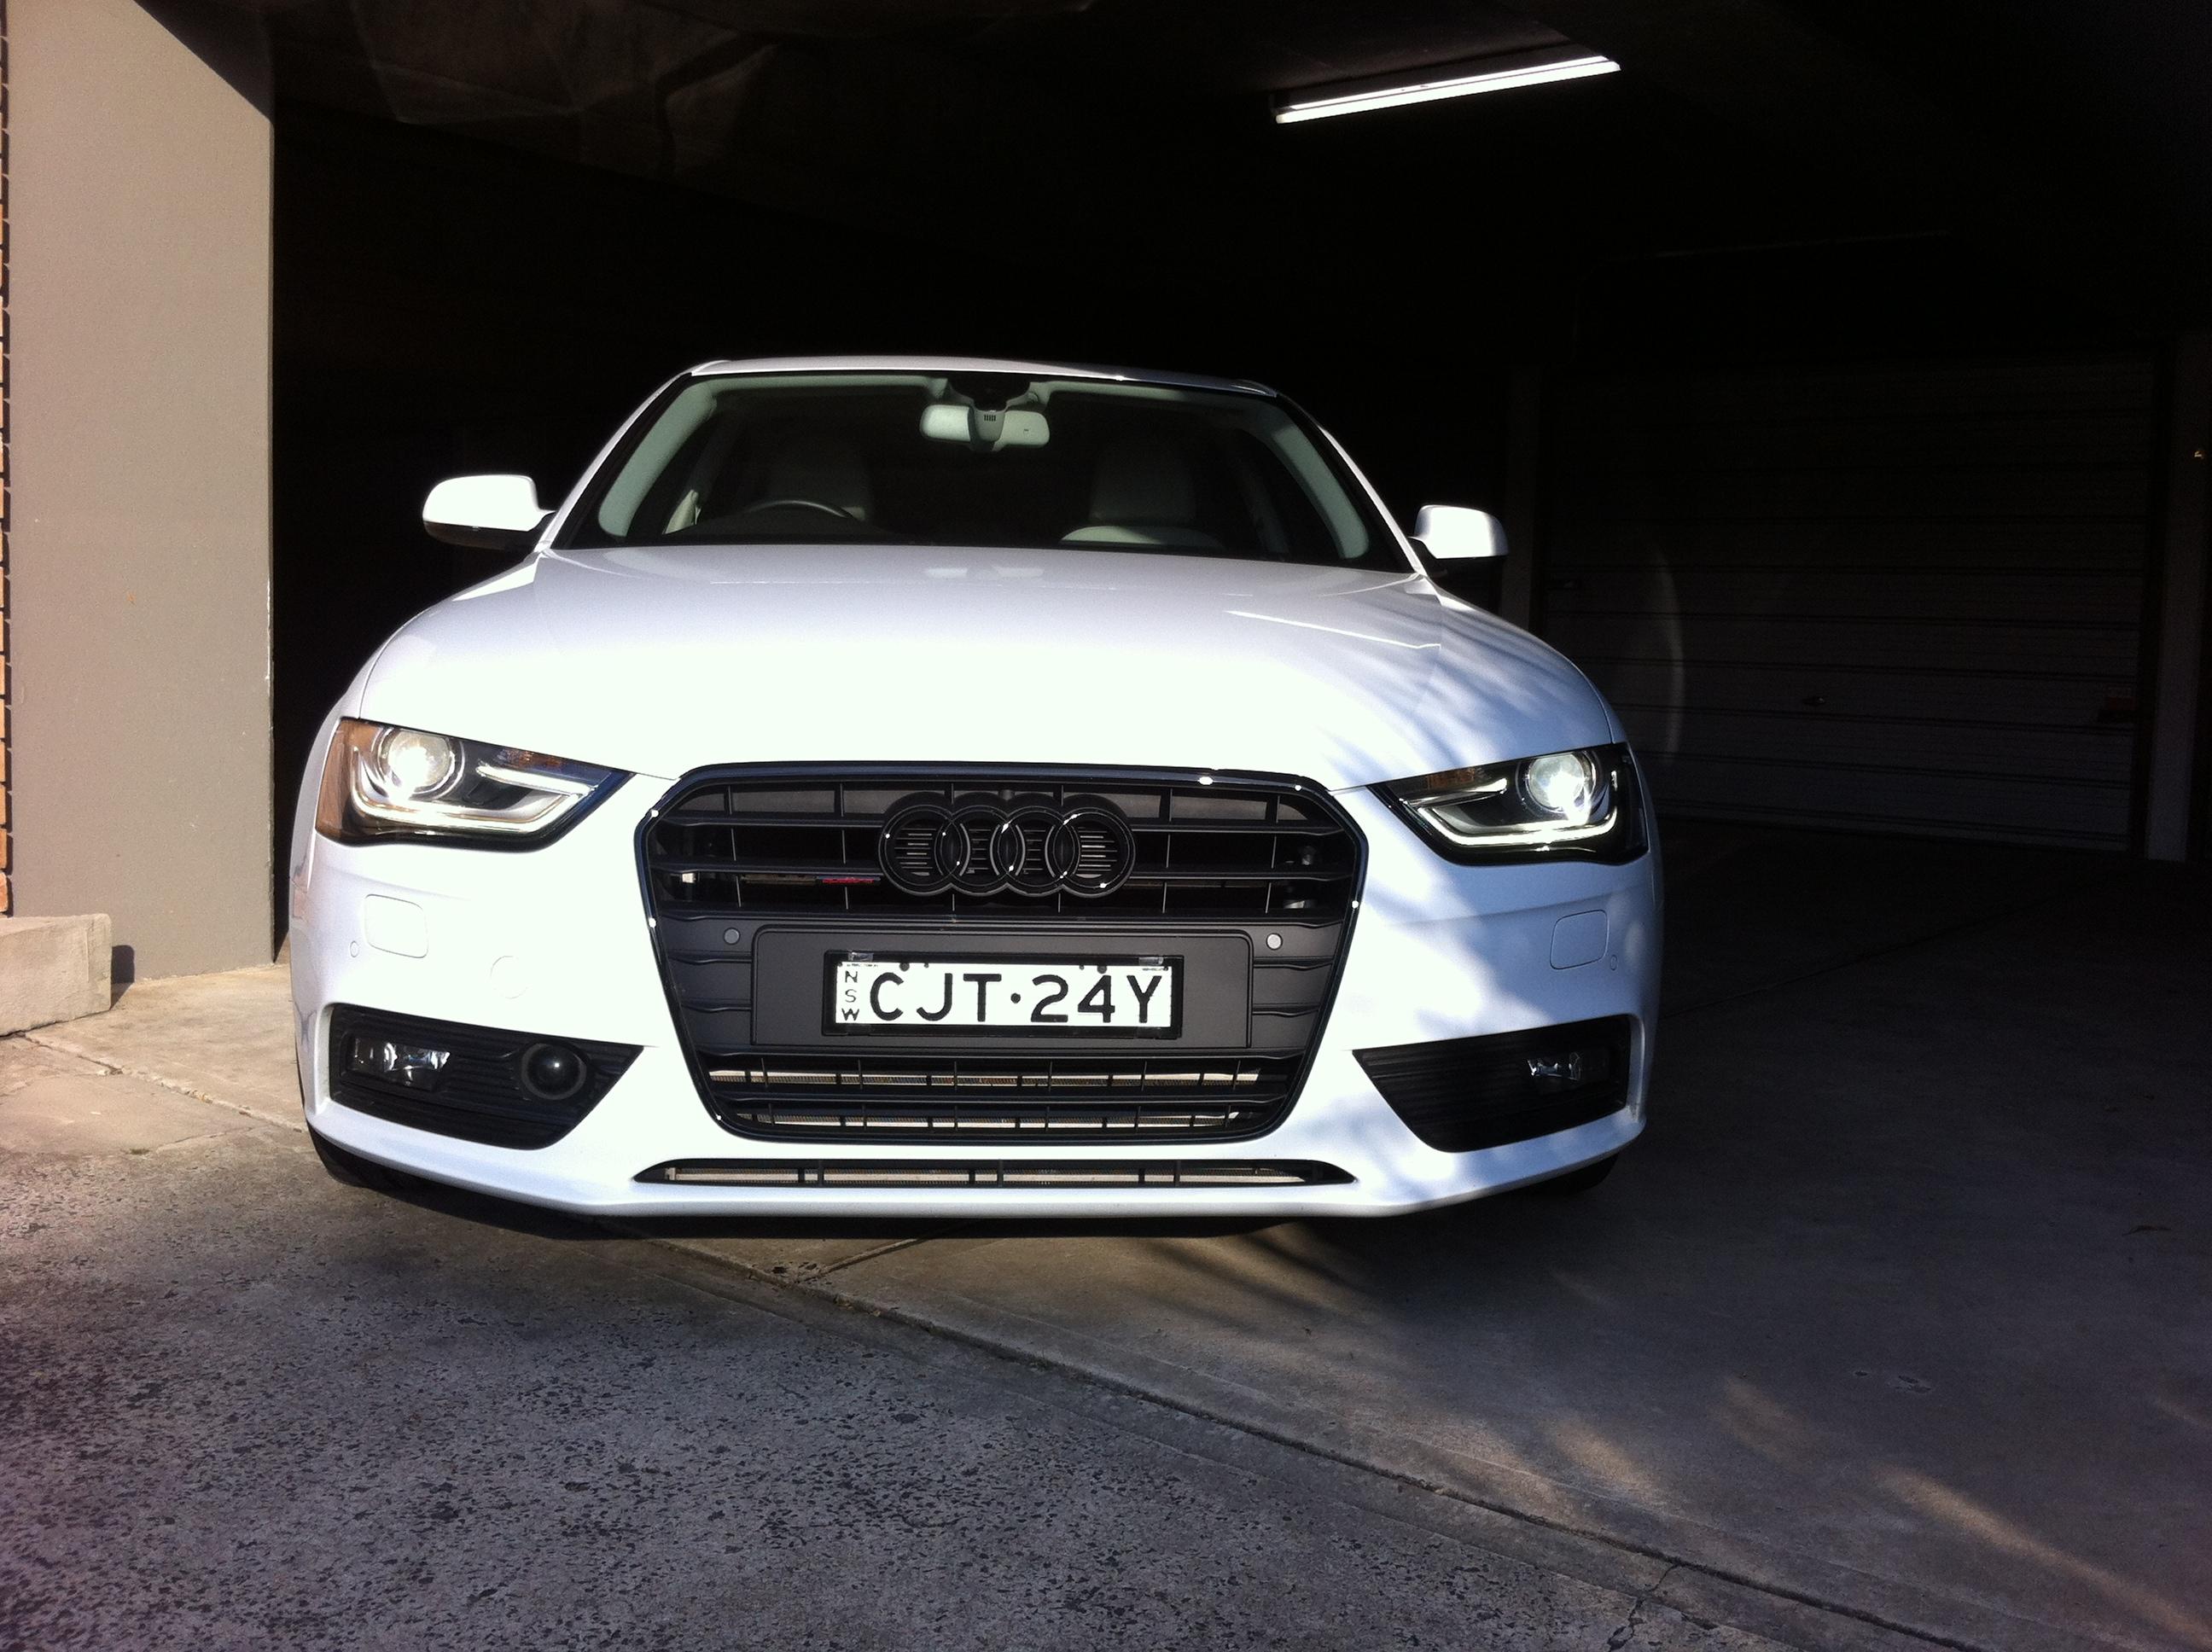 B8 5 S4 Front License Plate Holder / Frame / Mount | Audi